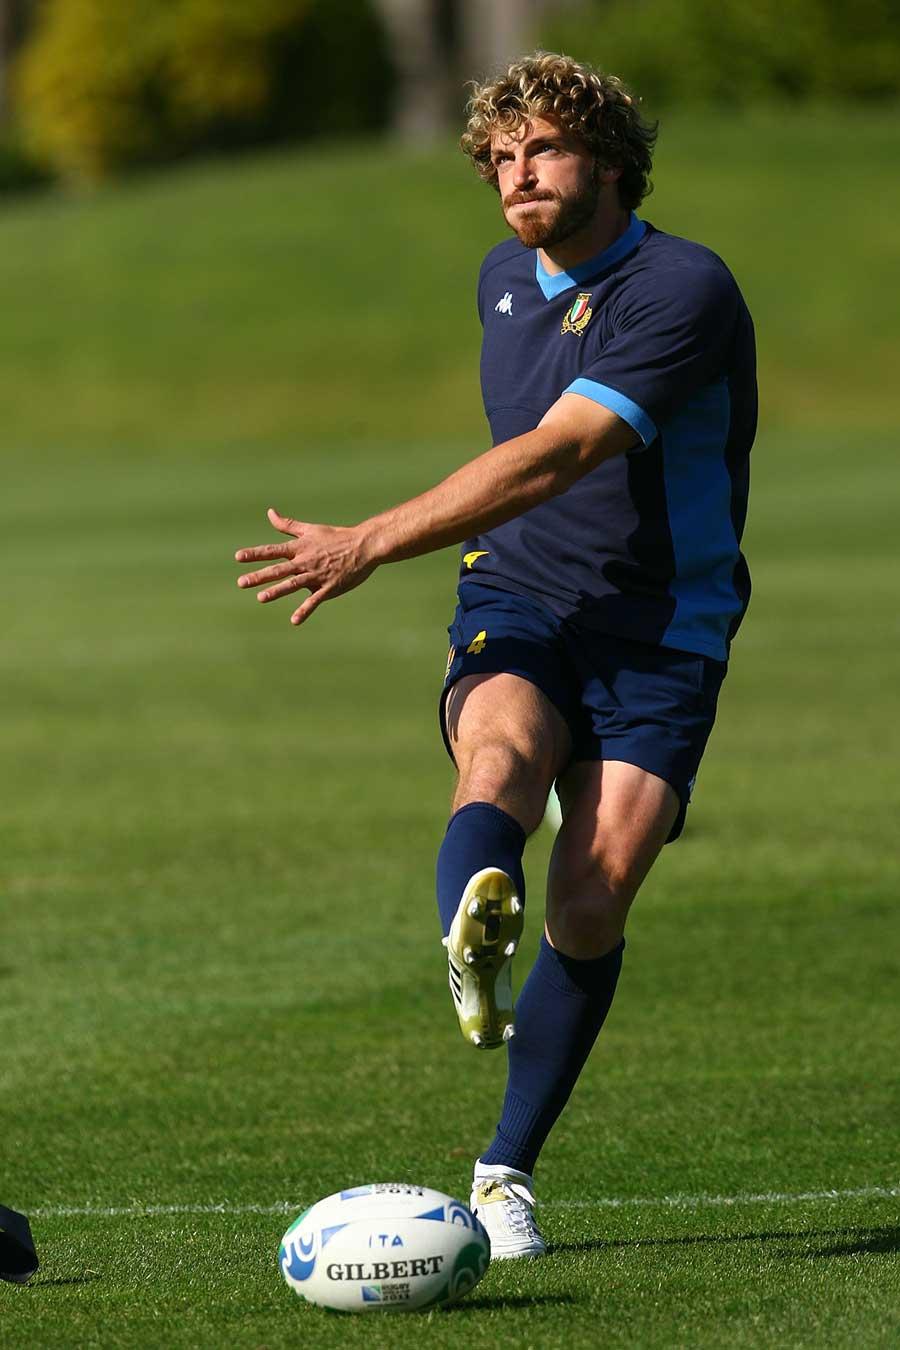 Italy's Mirco Bergamasco eyes up the posts during training